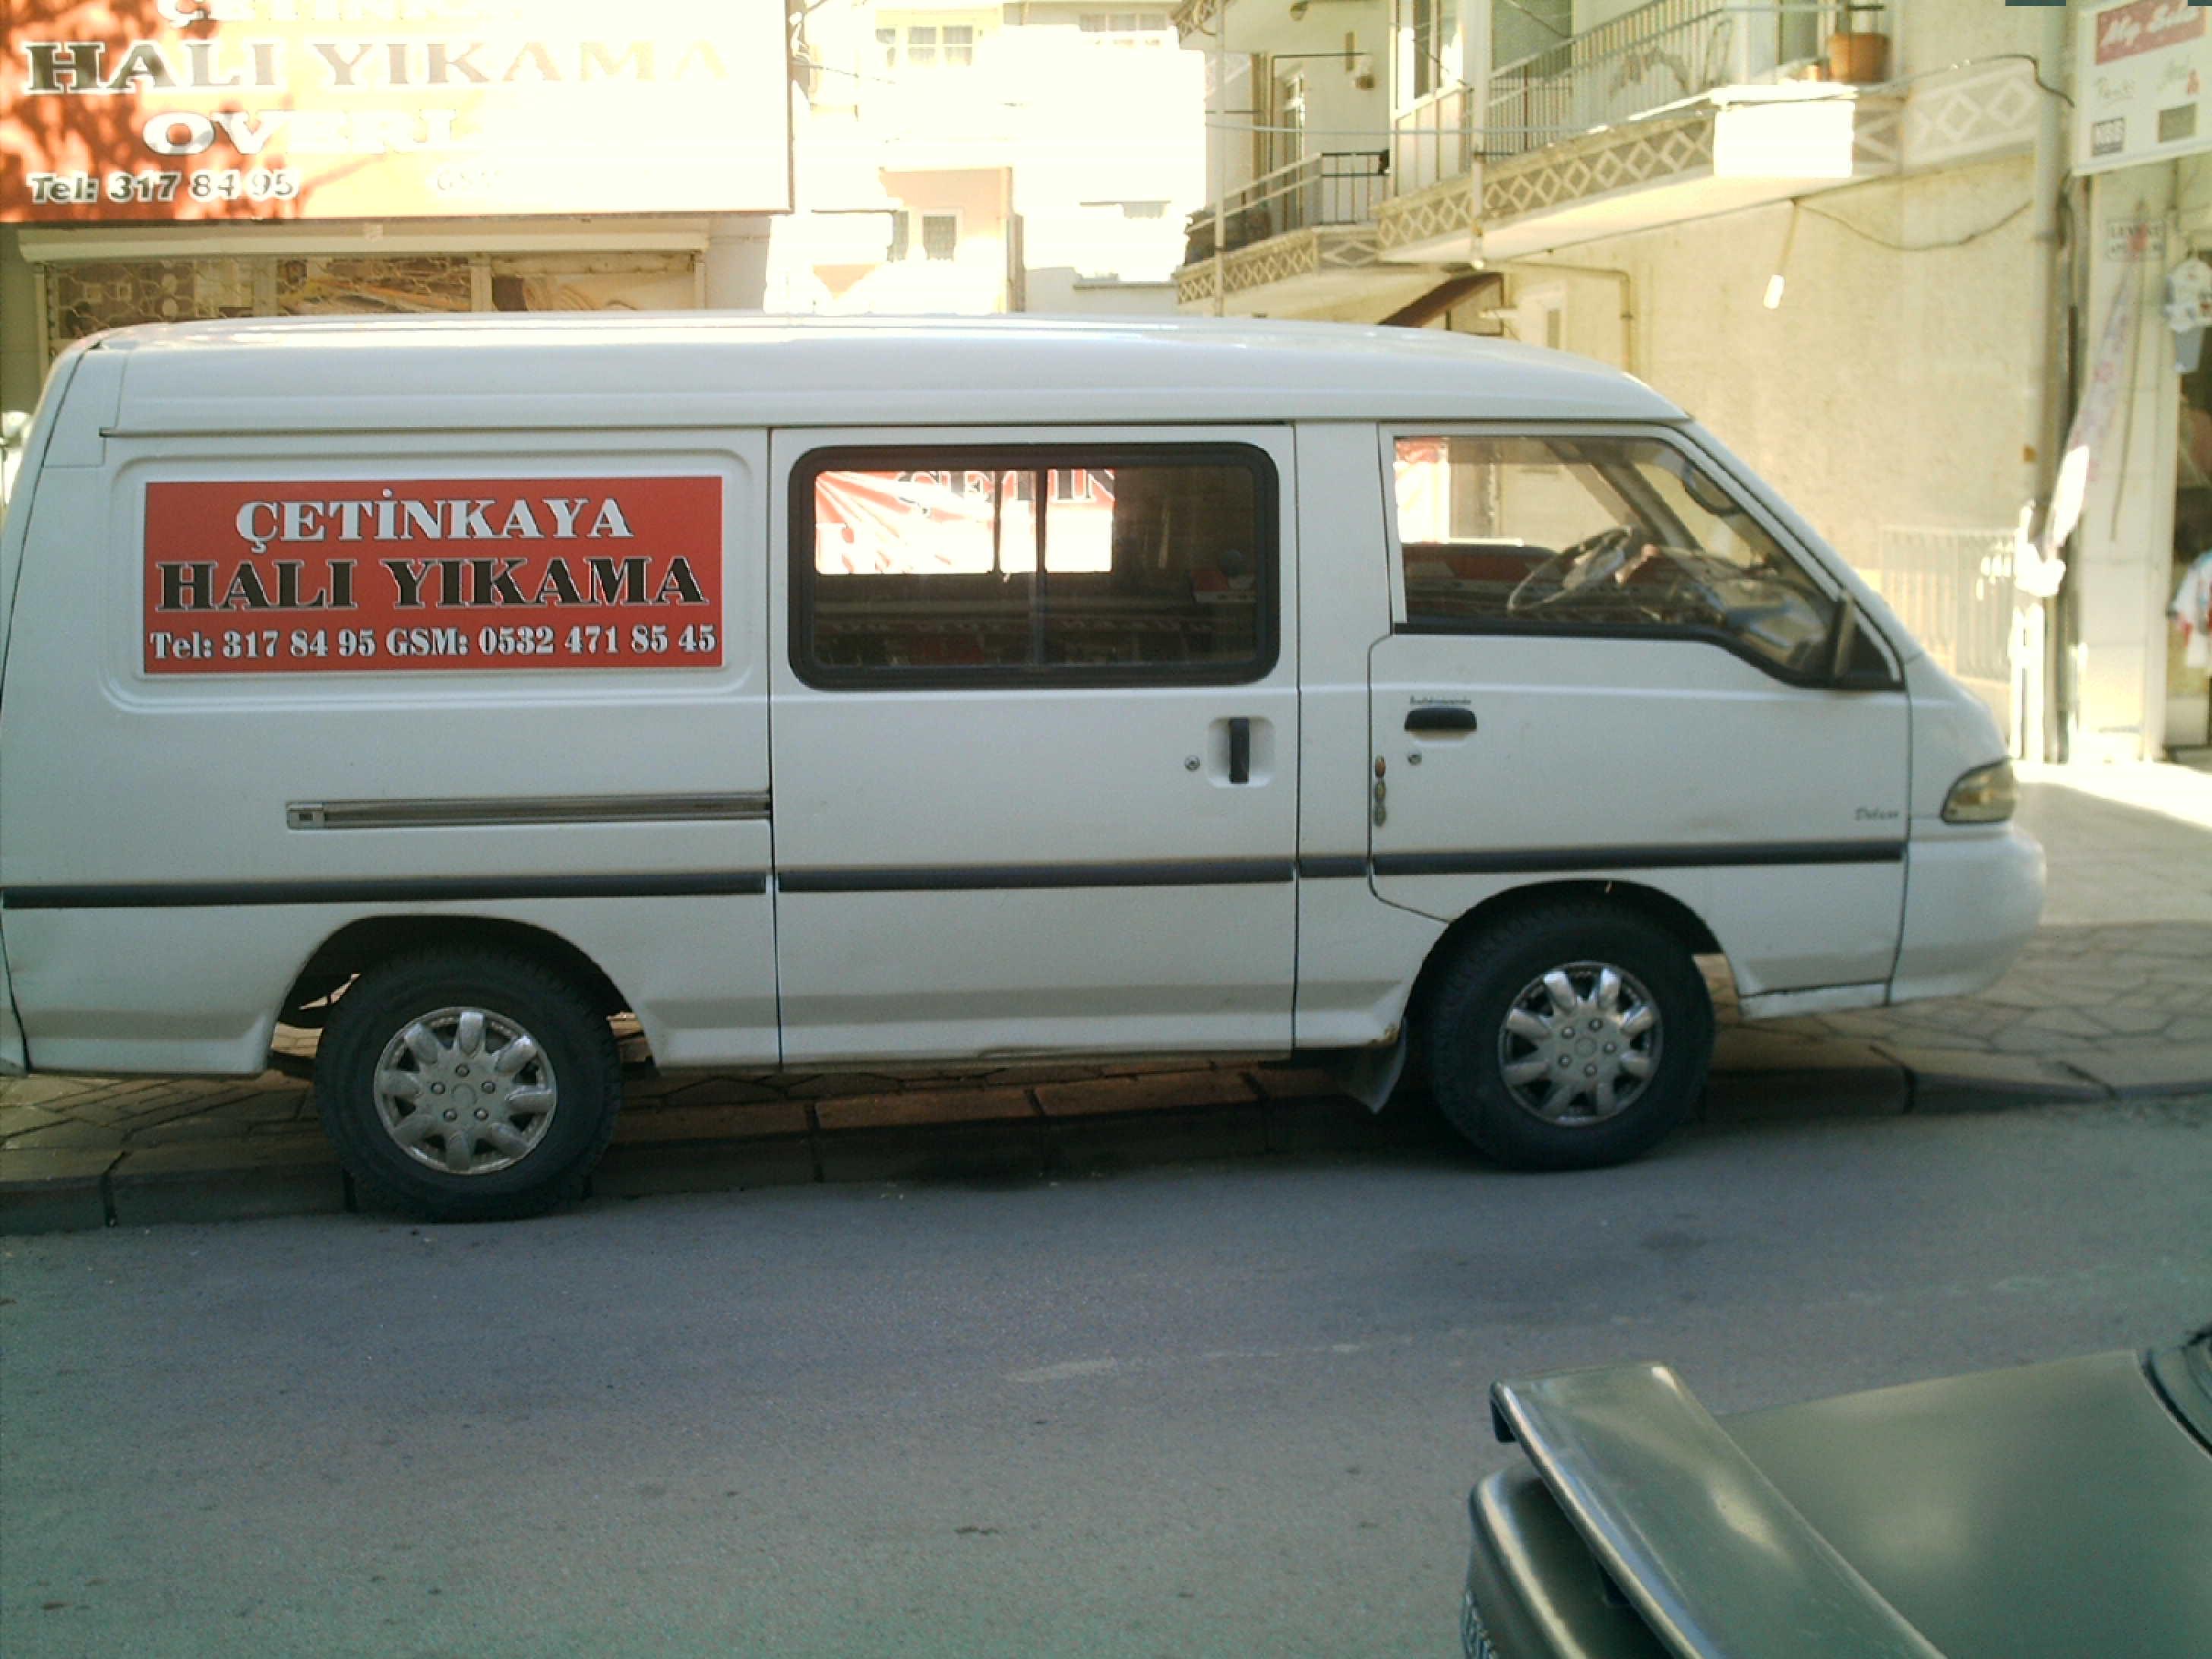 çayyolu_hali_yikama_servis_araci